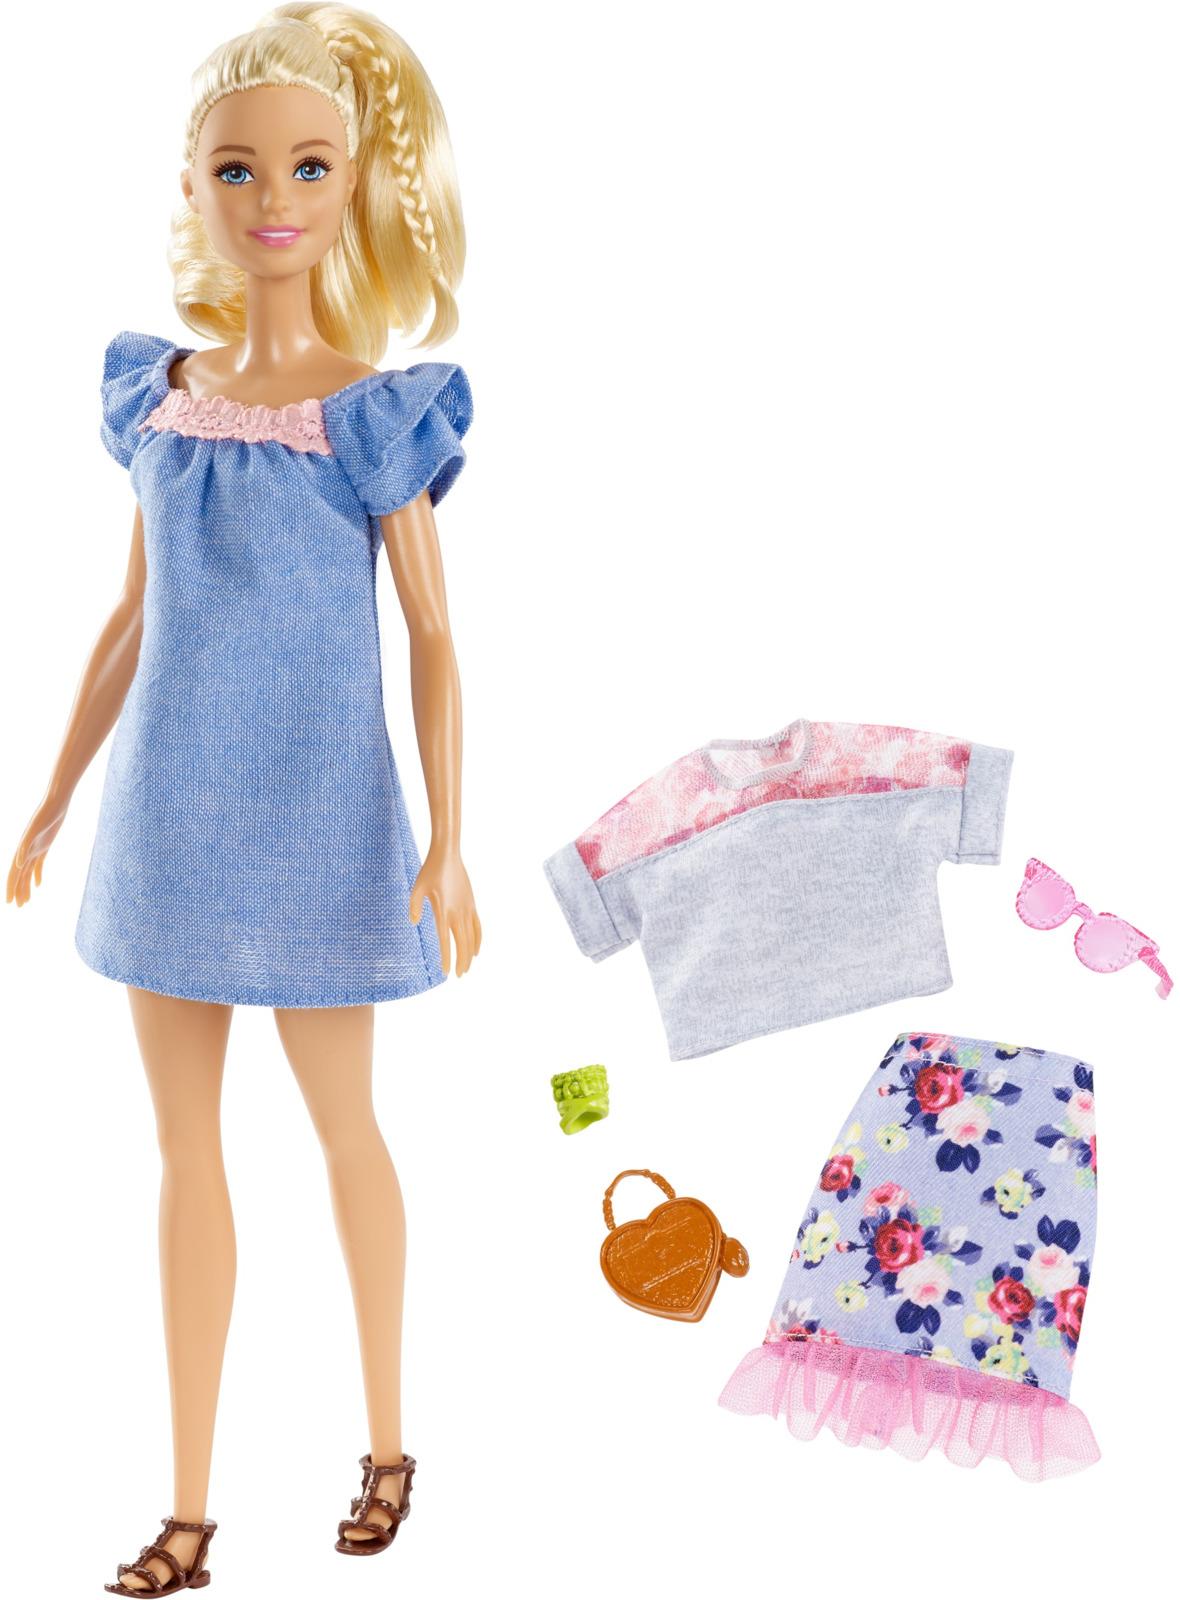 Фото - Barbie Кукла Игра с модой FJF67_FRY79 mattel кукла из серии игра с модой pretty in python barbie